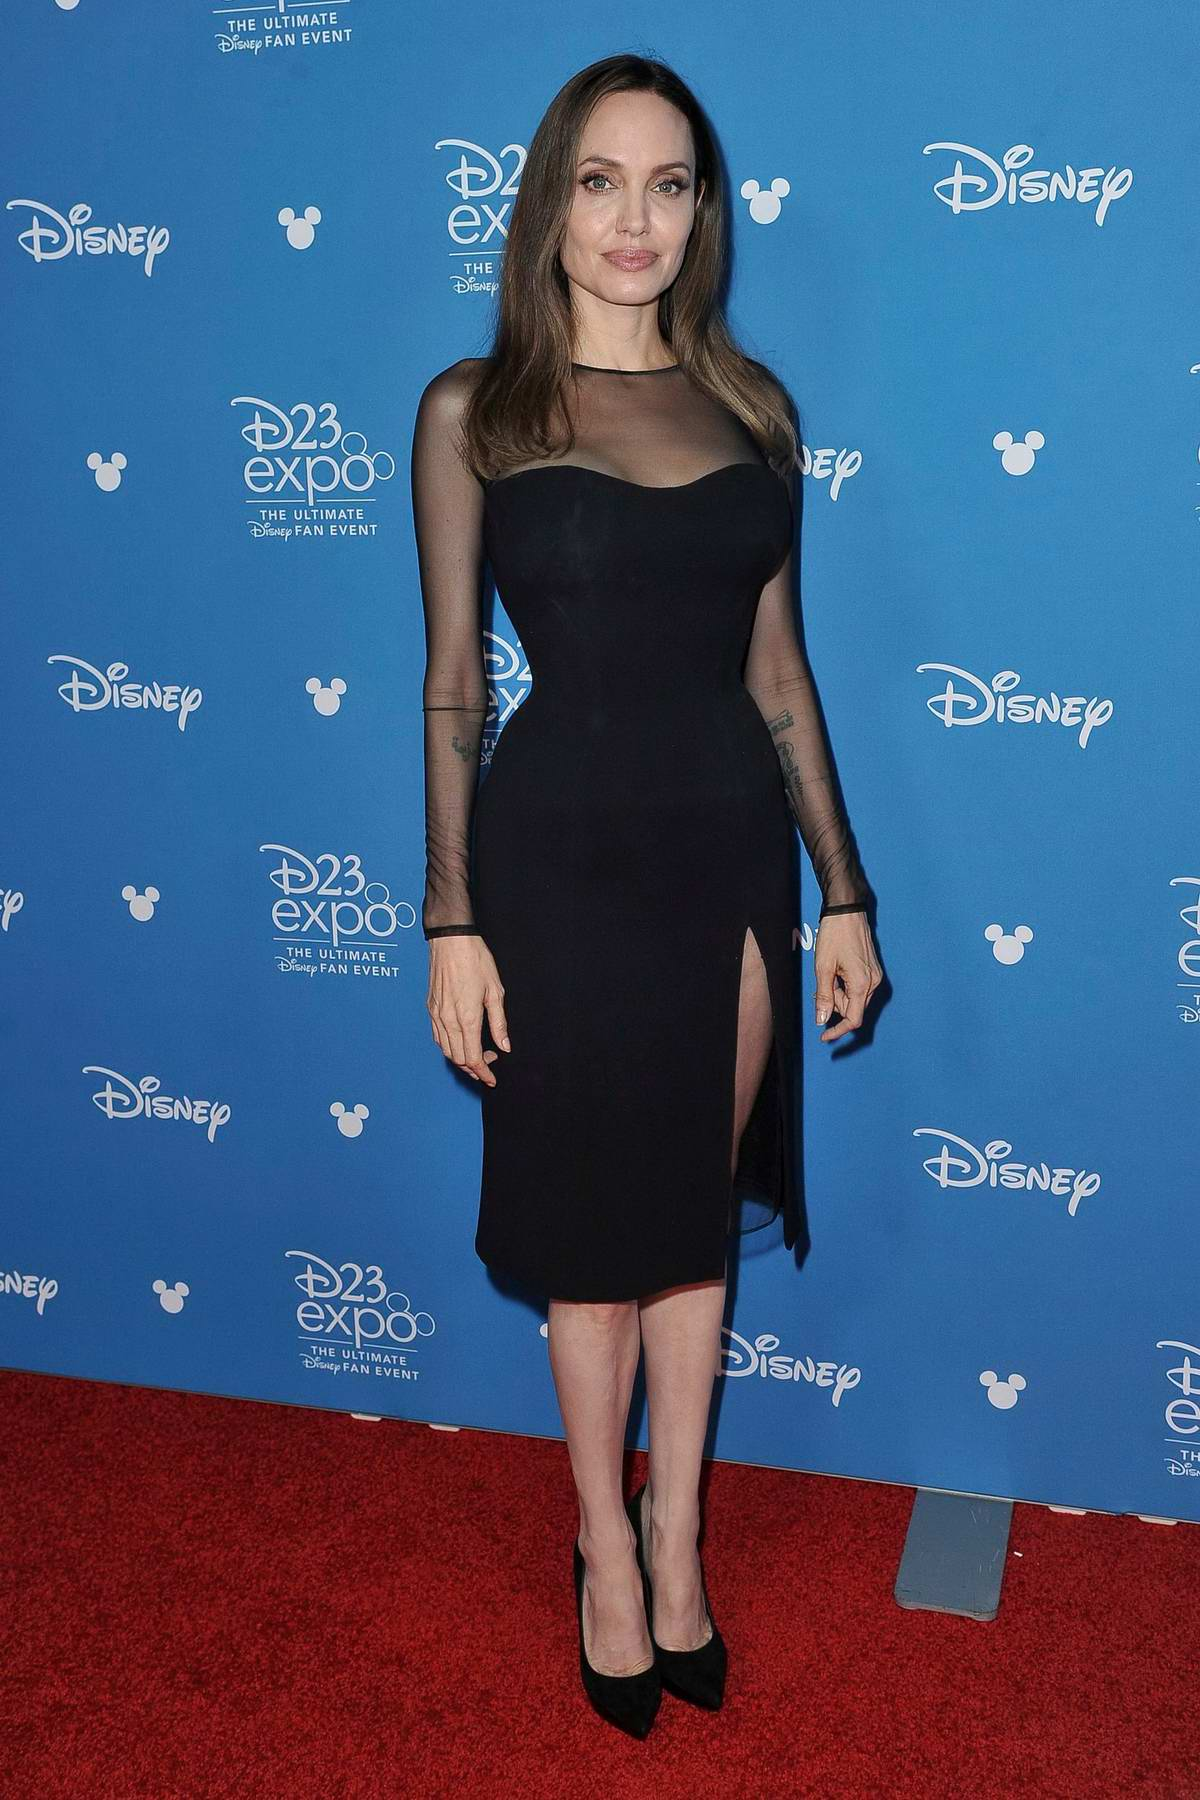 Angelina Jolie attends Disney D23 Expo 2019 at Anaheim Convention Center in Anaheim, California